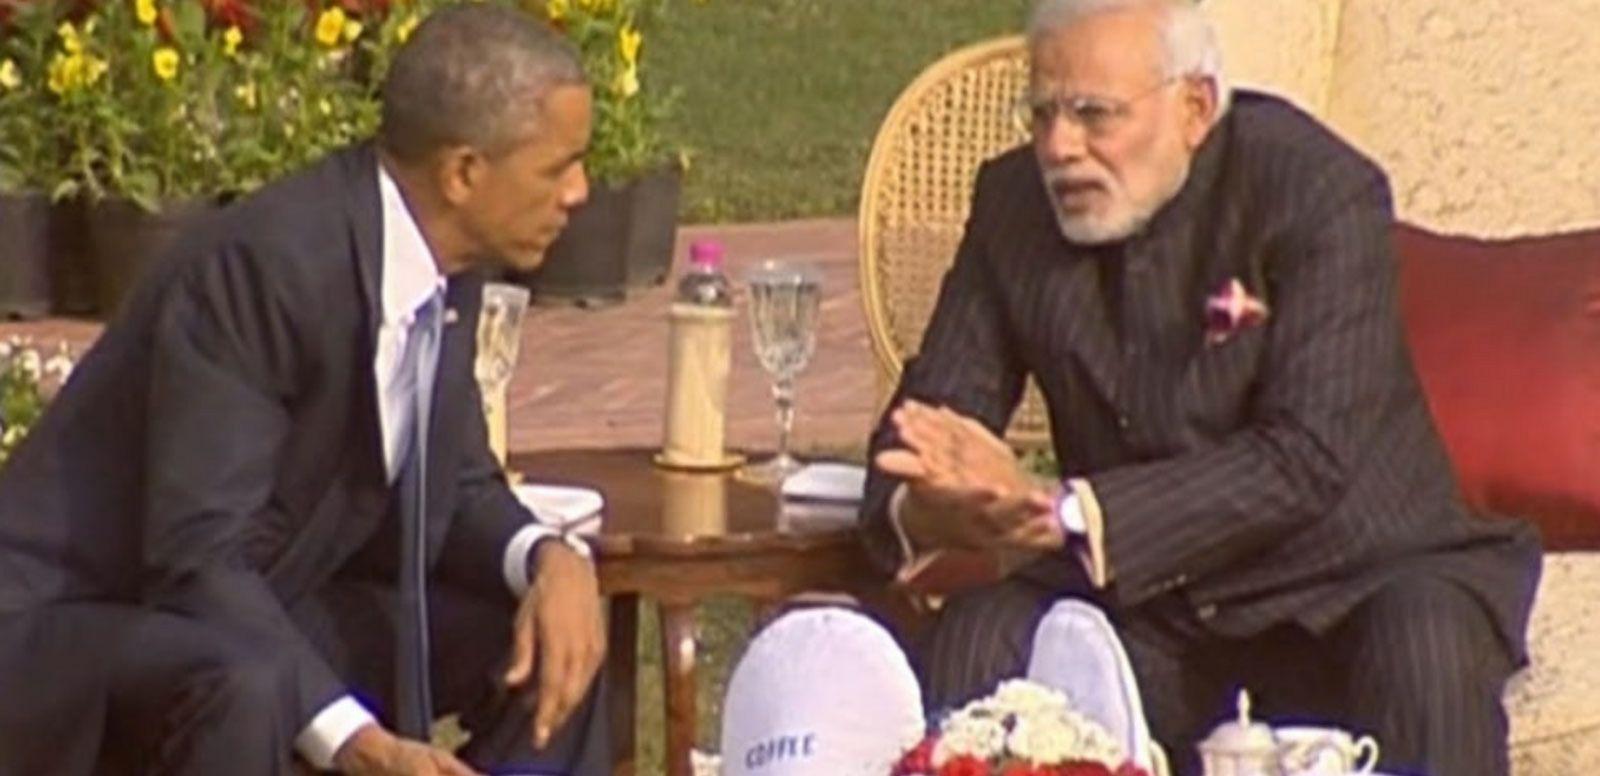 VIDEO: Unprecedented Security for Obama India Trip